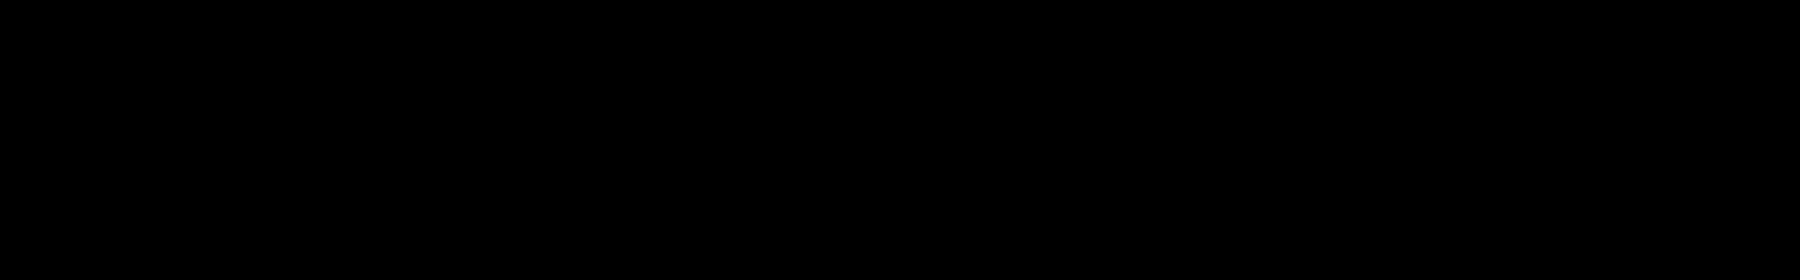 MONARK SOLITUDES audio waveform